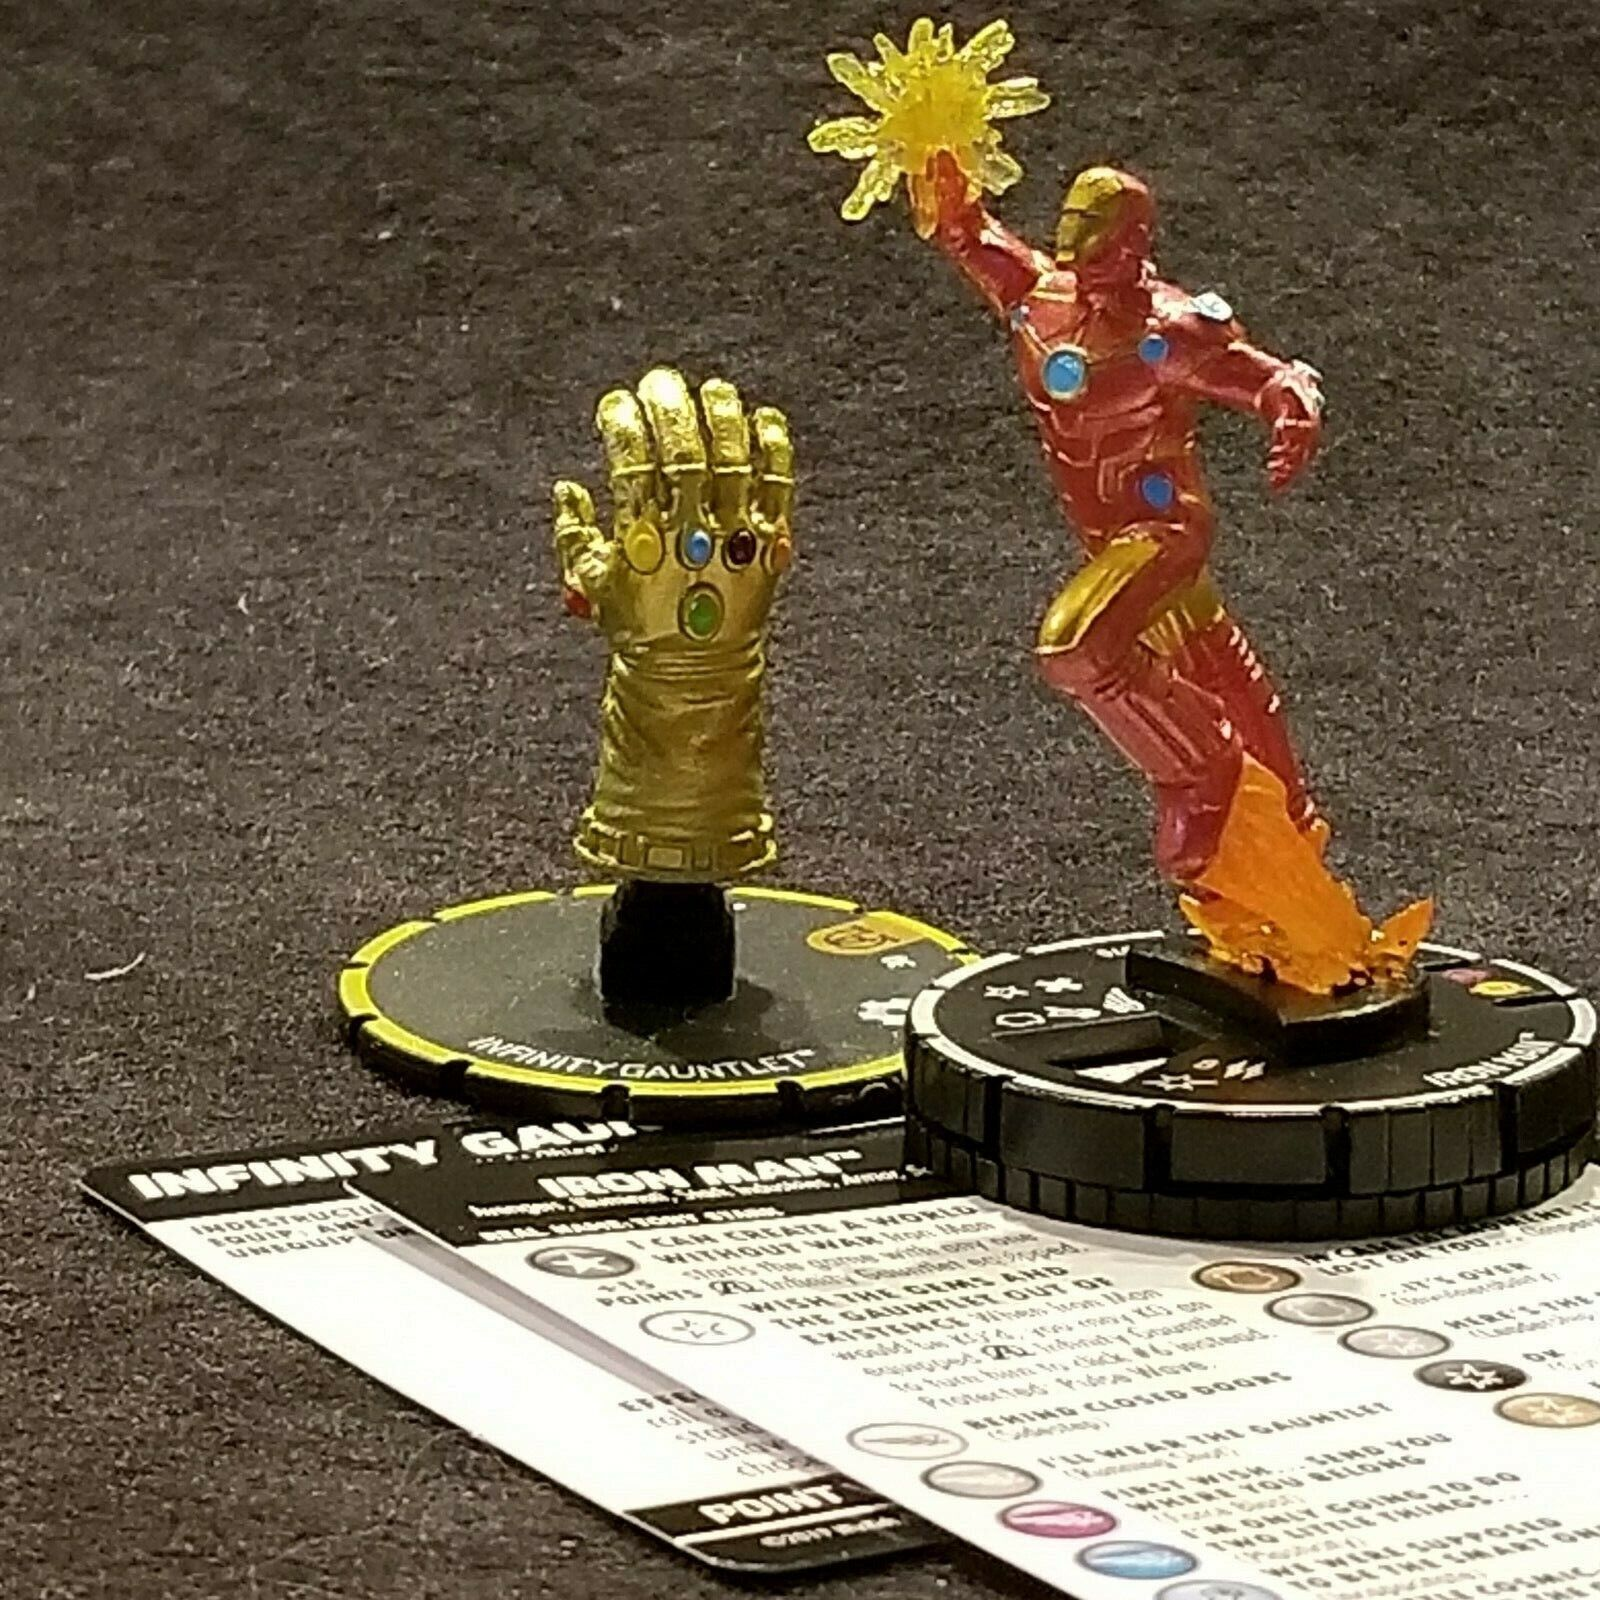 Iron Man 070 & Infinito Gauntlet s009 Chase Heroclix Pantera Negra y Illuminati